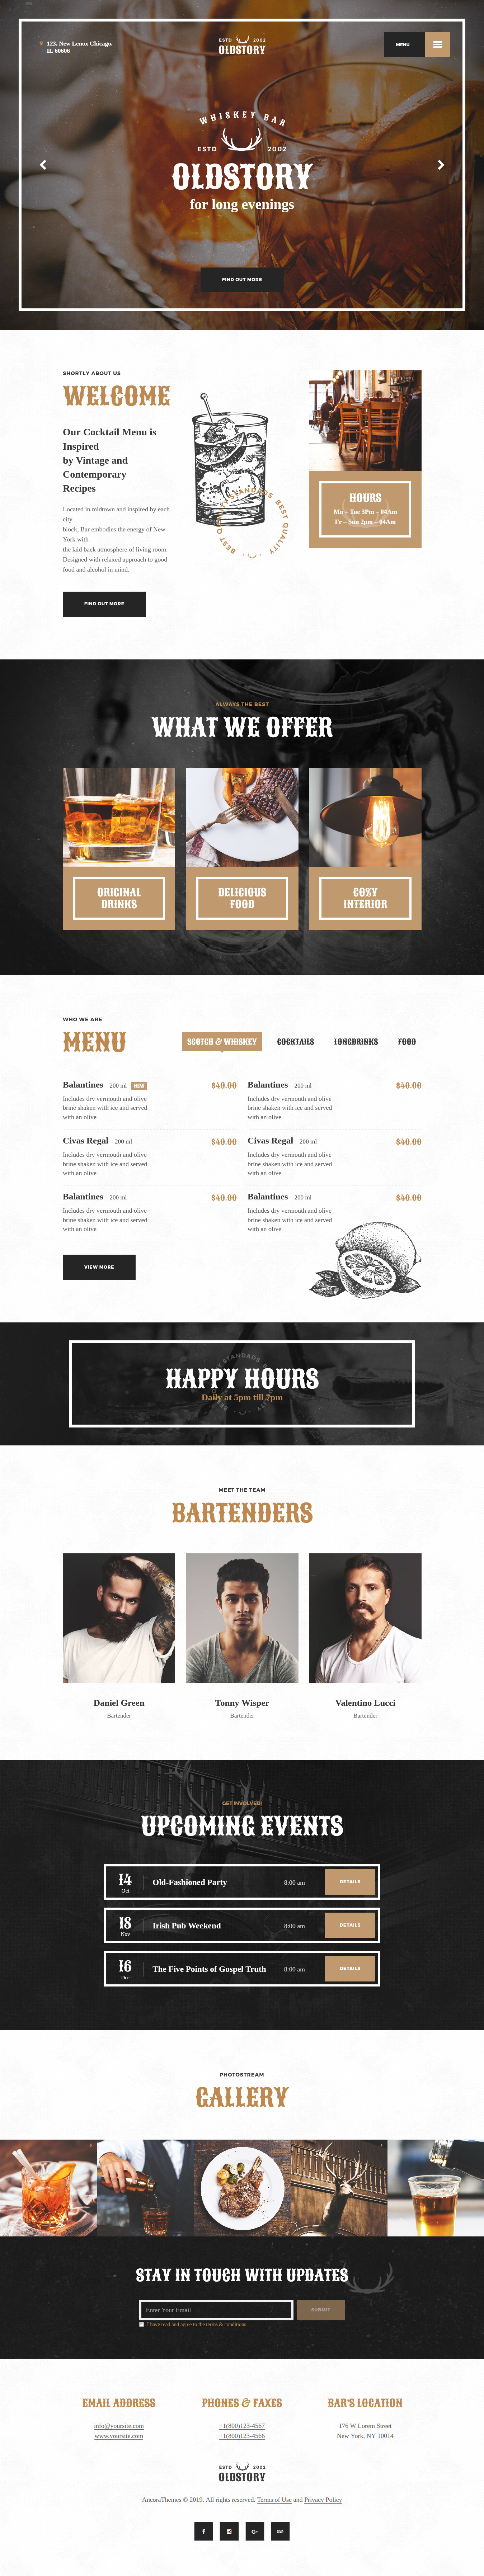 OldStory - Best Premium Bar and Pub WordPress Theme